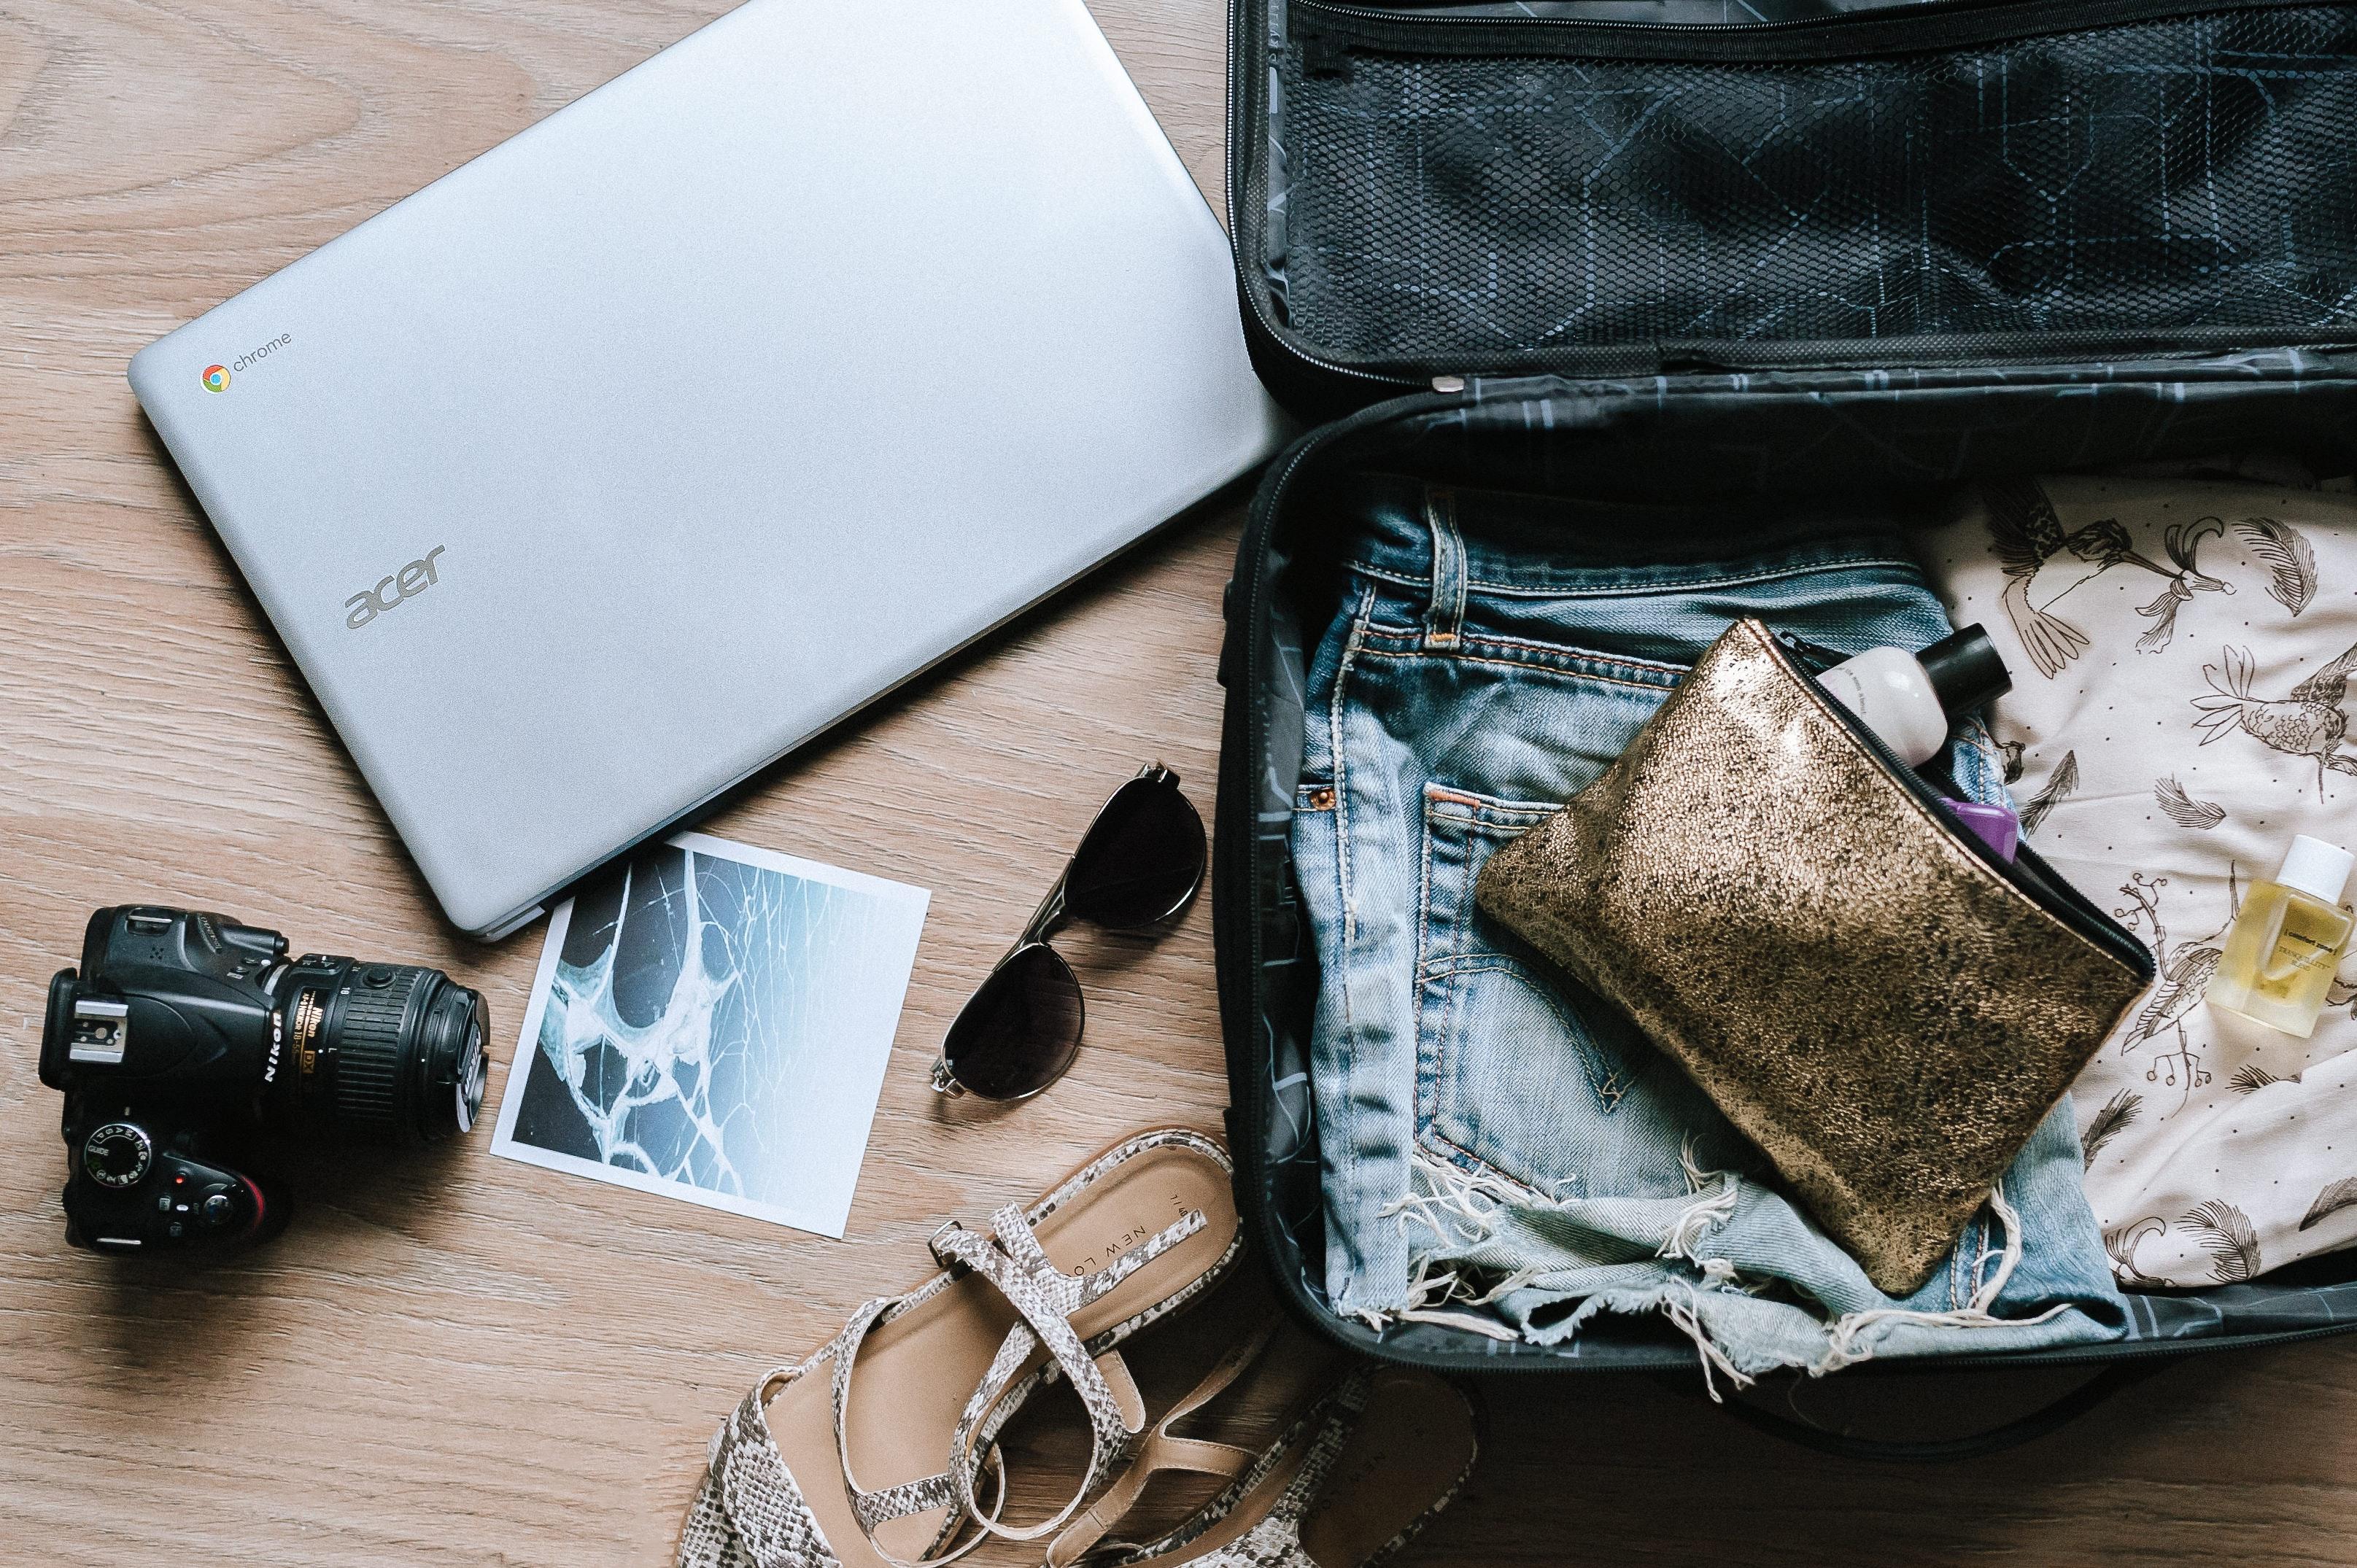 Suitcase with laptop, camera and makeup bag